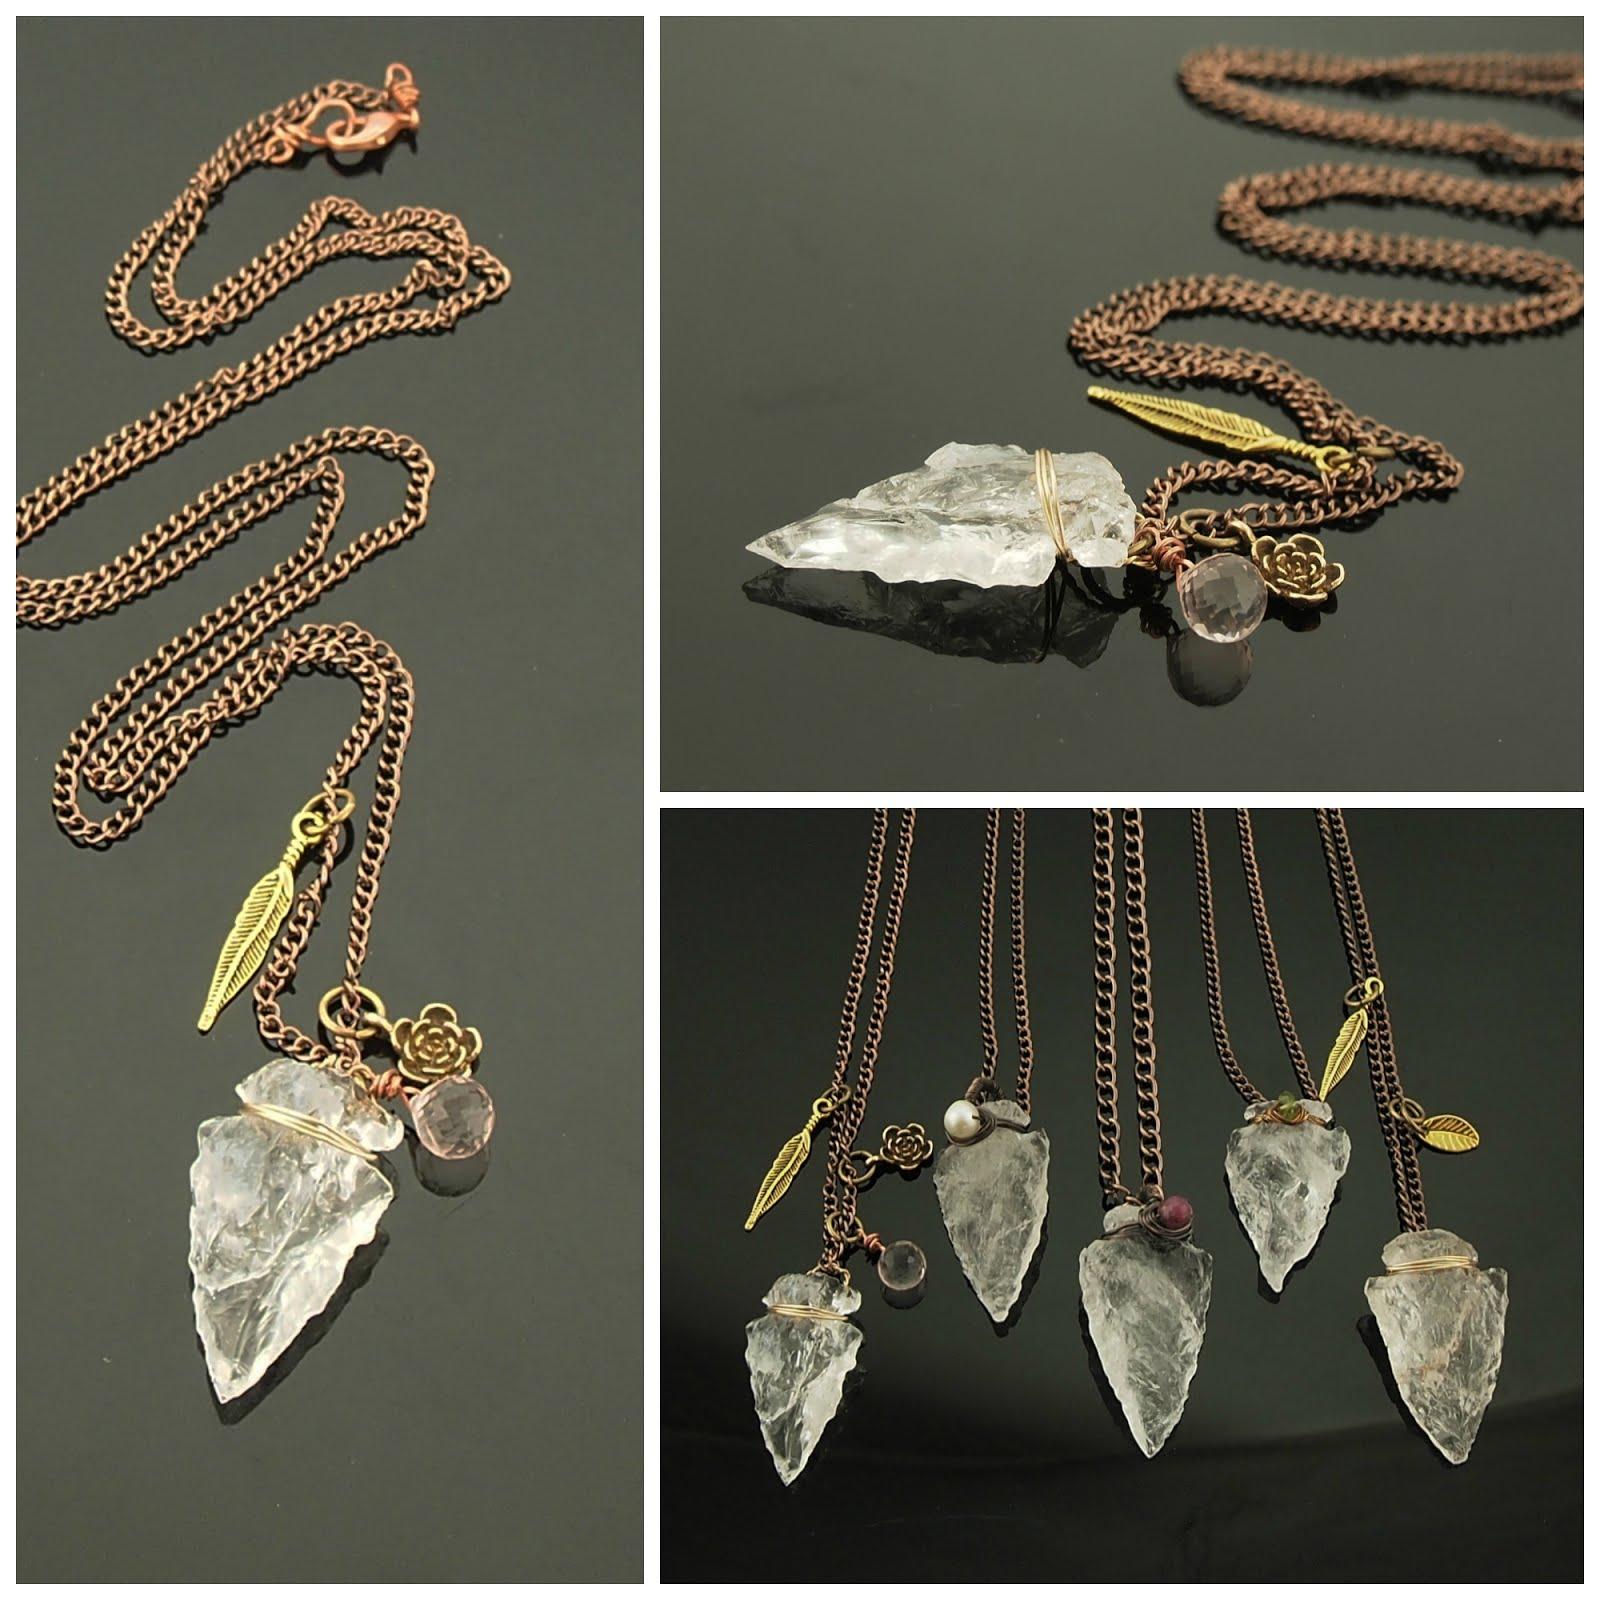 Healing Crystal Gifts